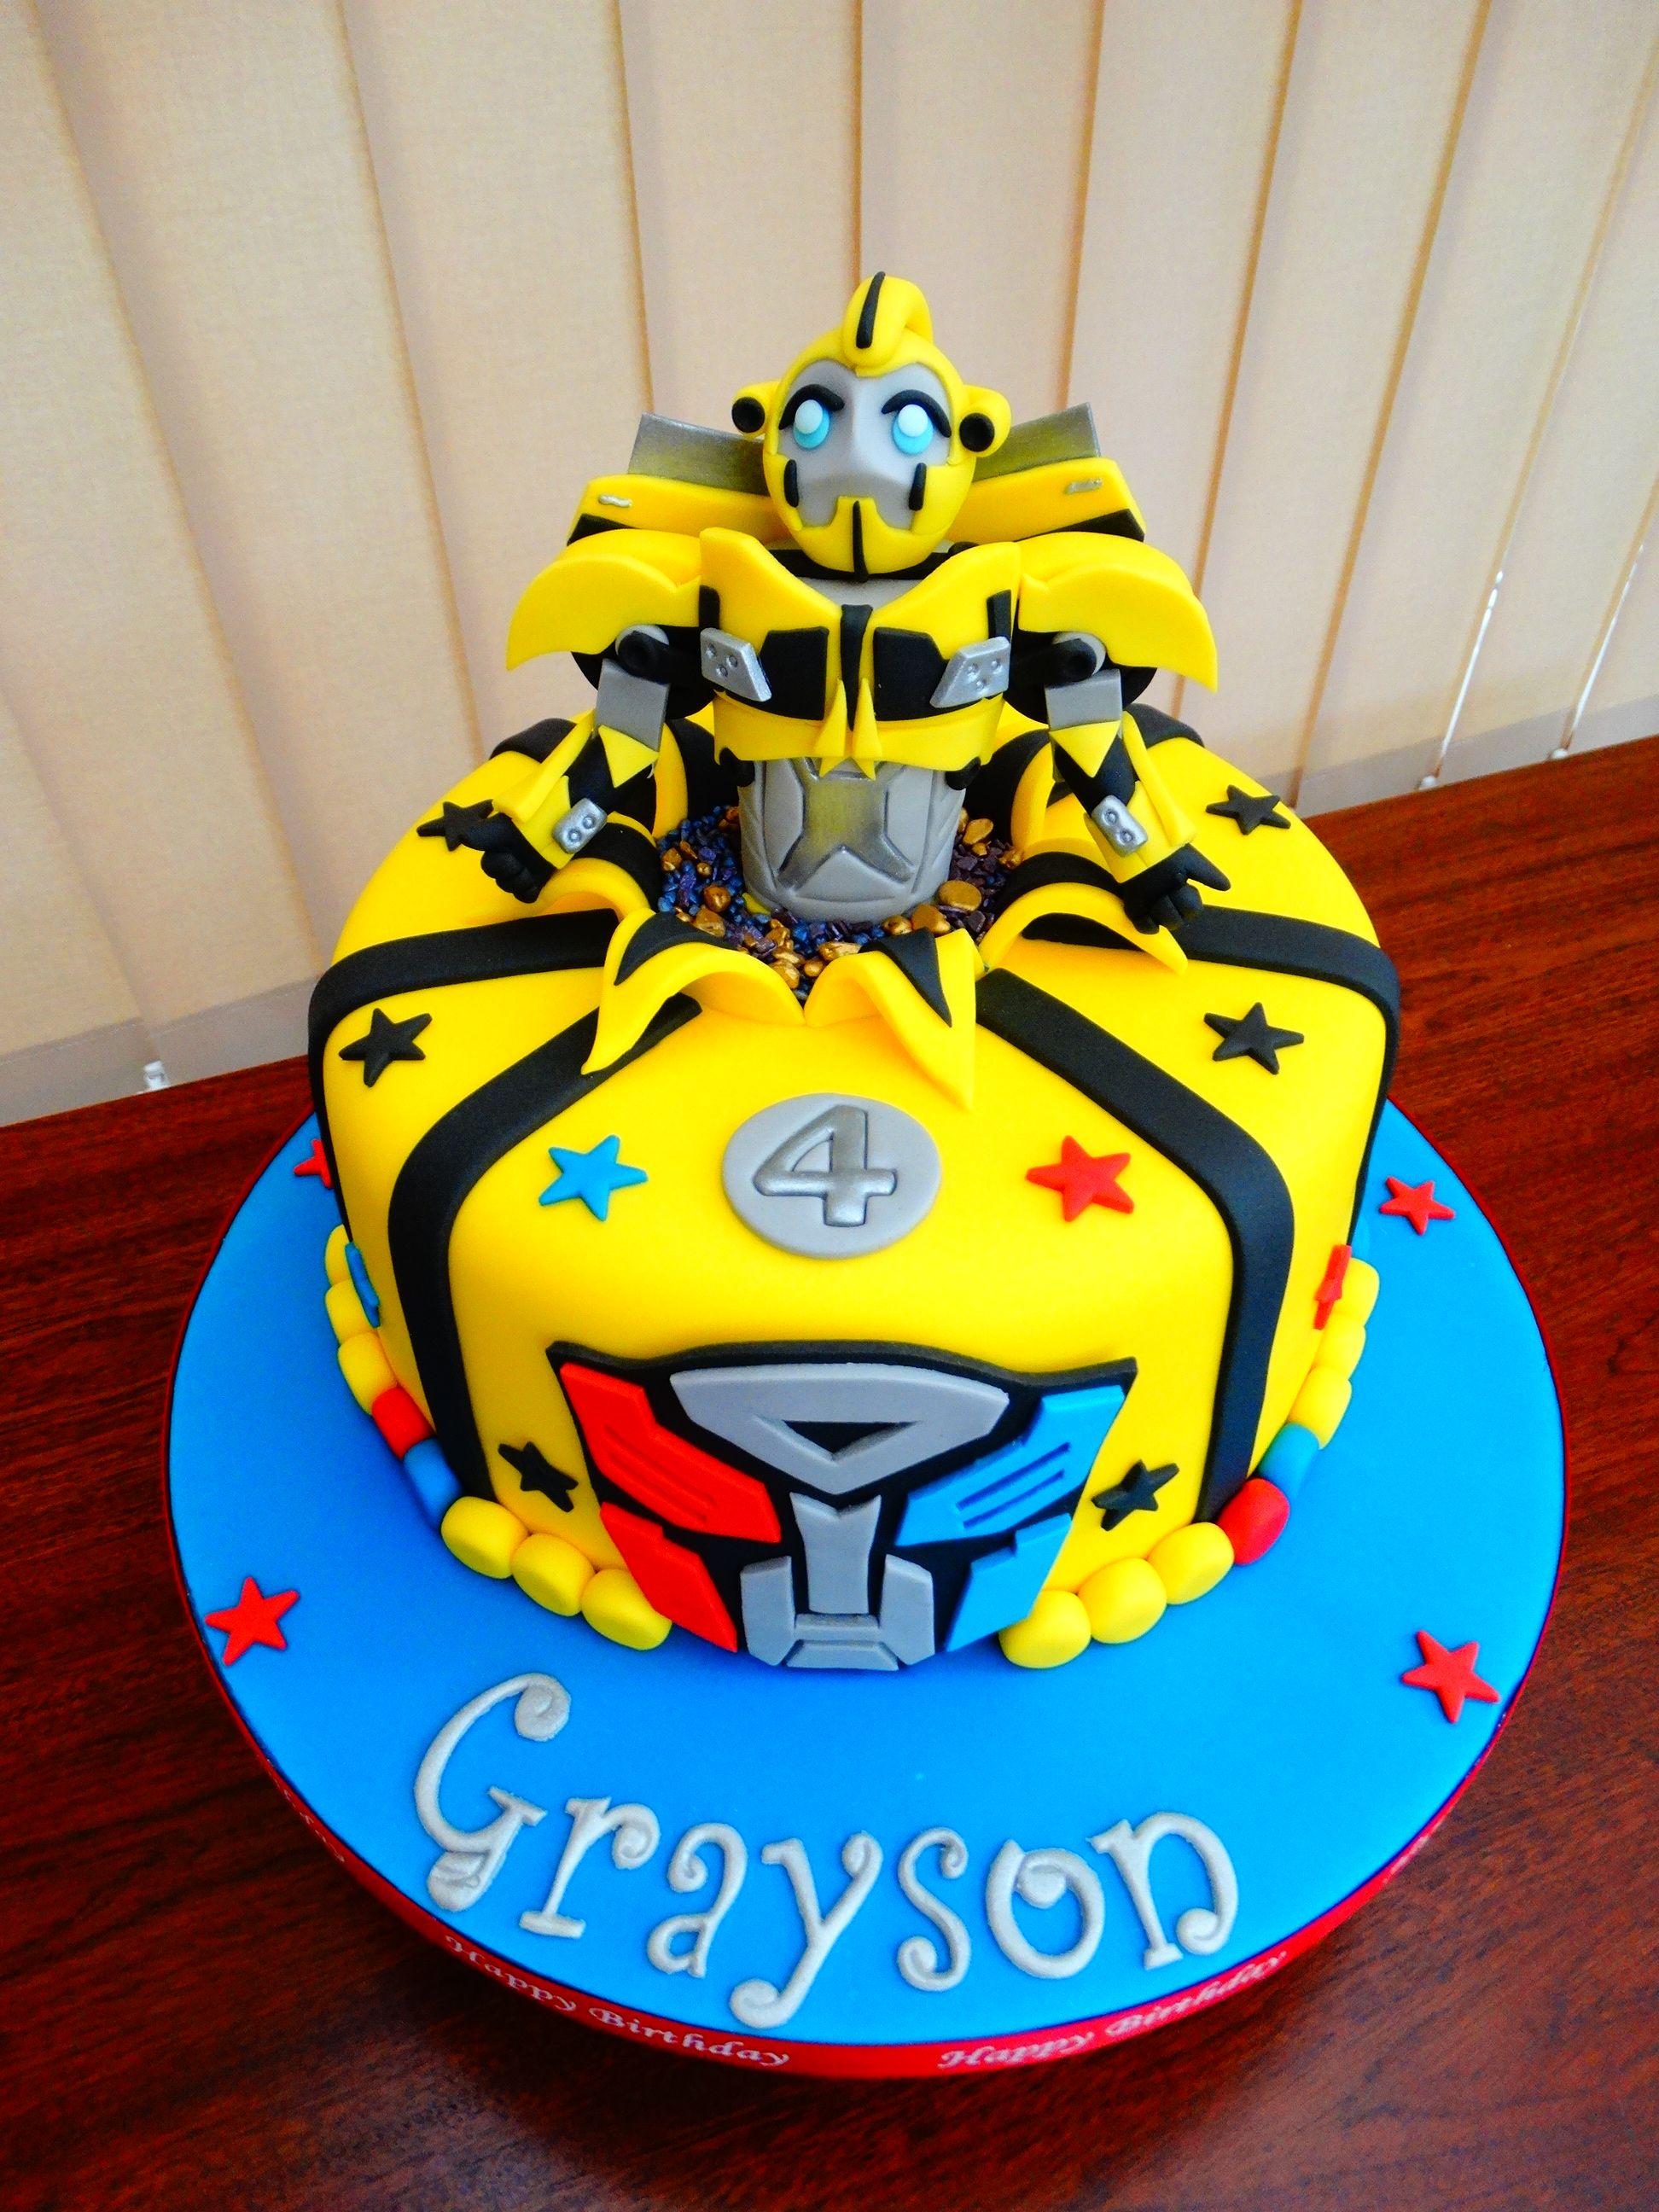 Tremendous Bumblebee Transformers Cake Xmcx Transformers Birthday Cake Funny Birthday Cards Online Inifofree Goldxyz